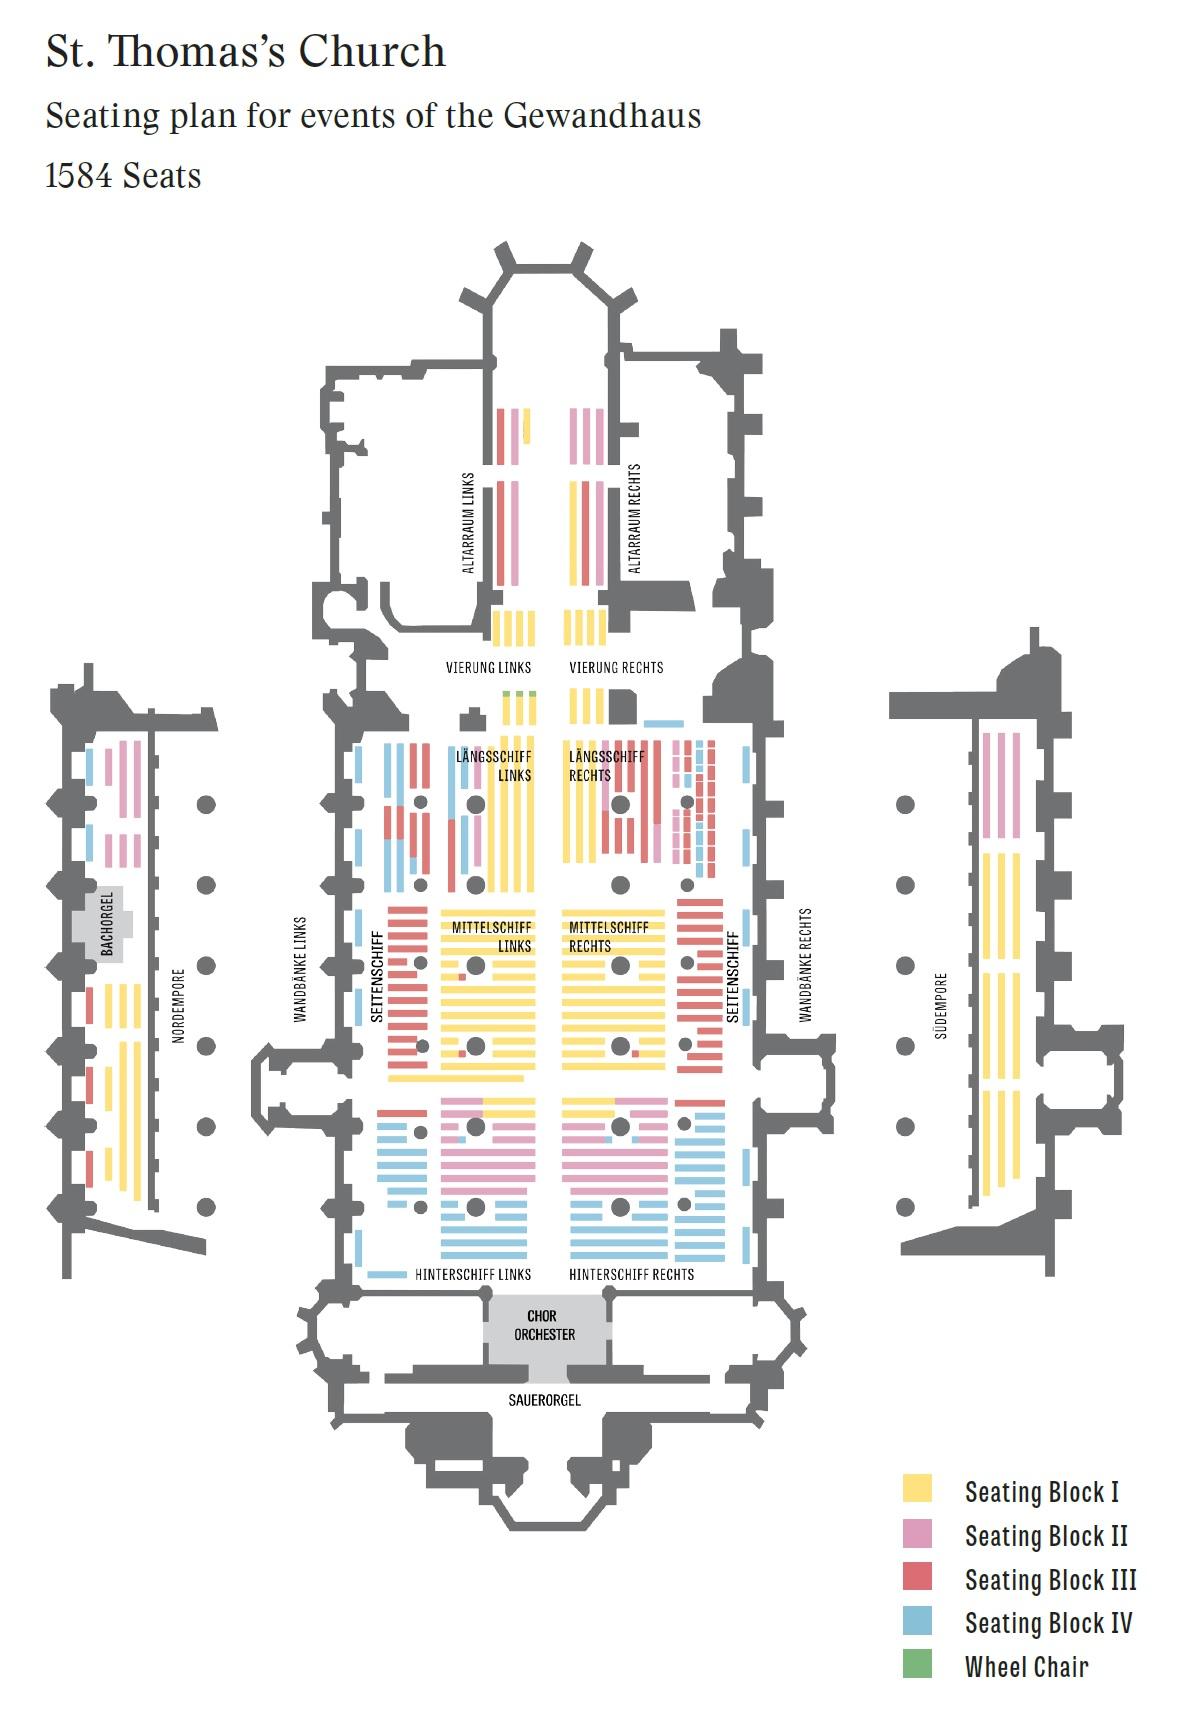 Концертный зал Гевандхауз / Gewandhaus - схема зала в церкви Св. Томаса